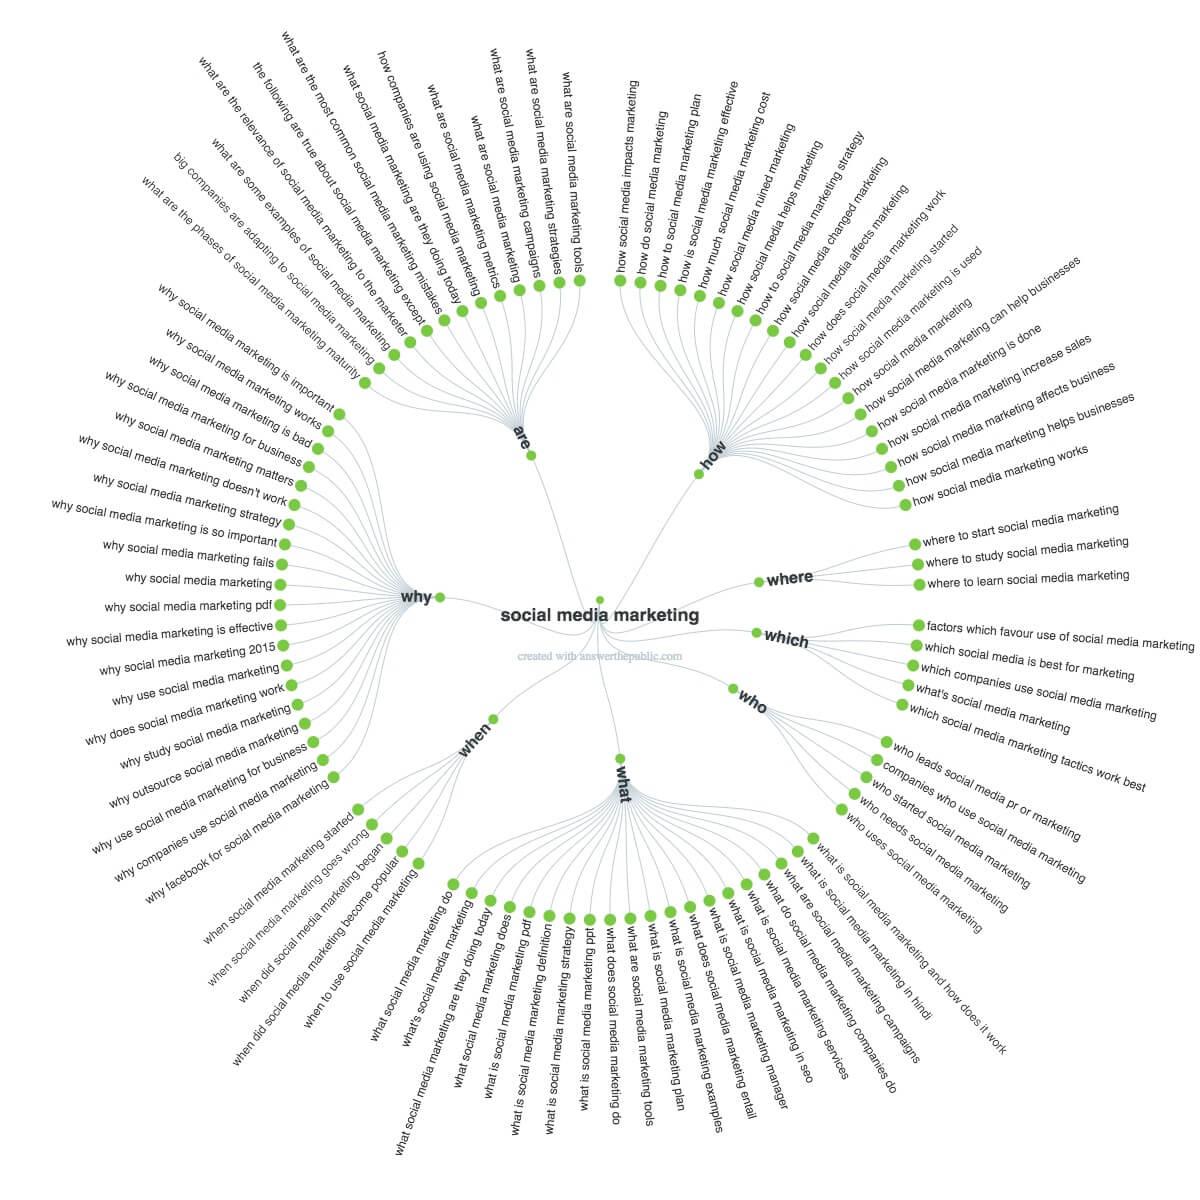 Linkedin pulse answer the public - topic ideas